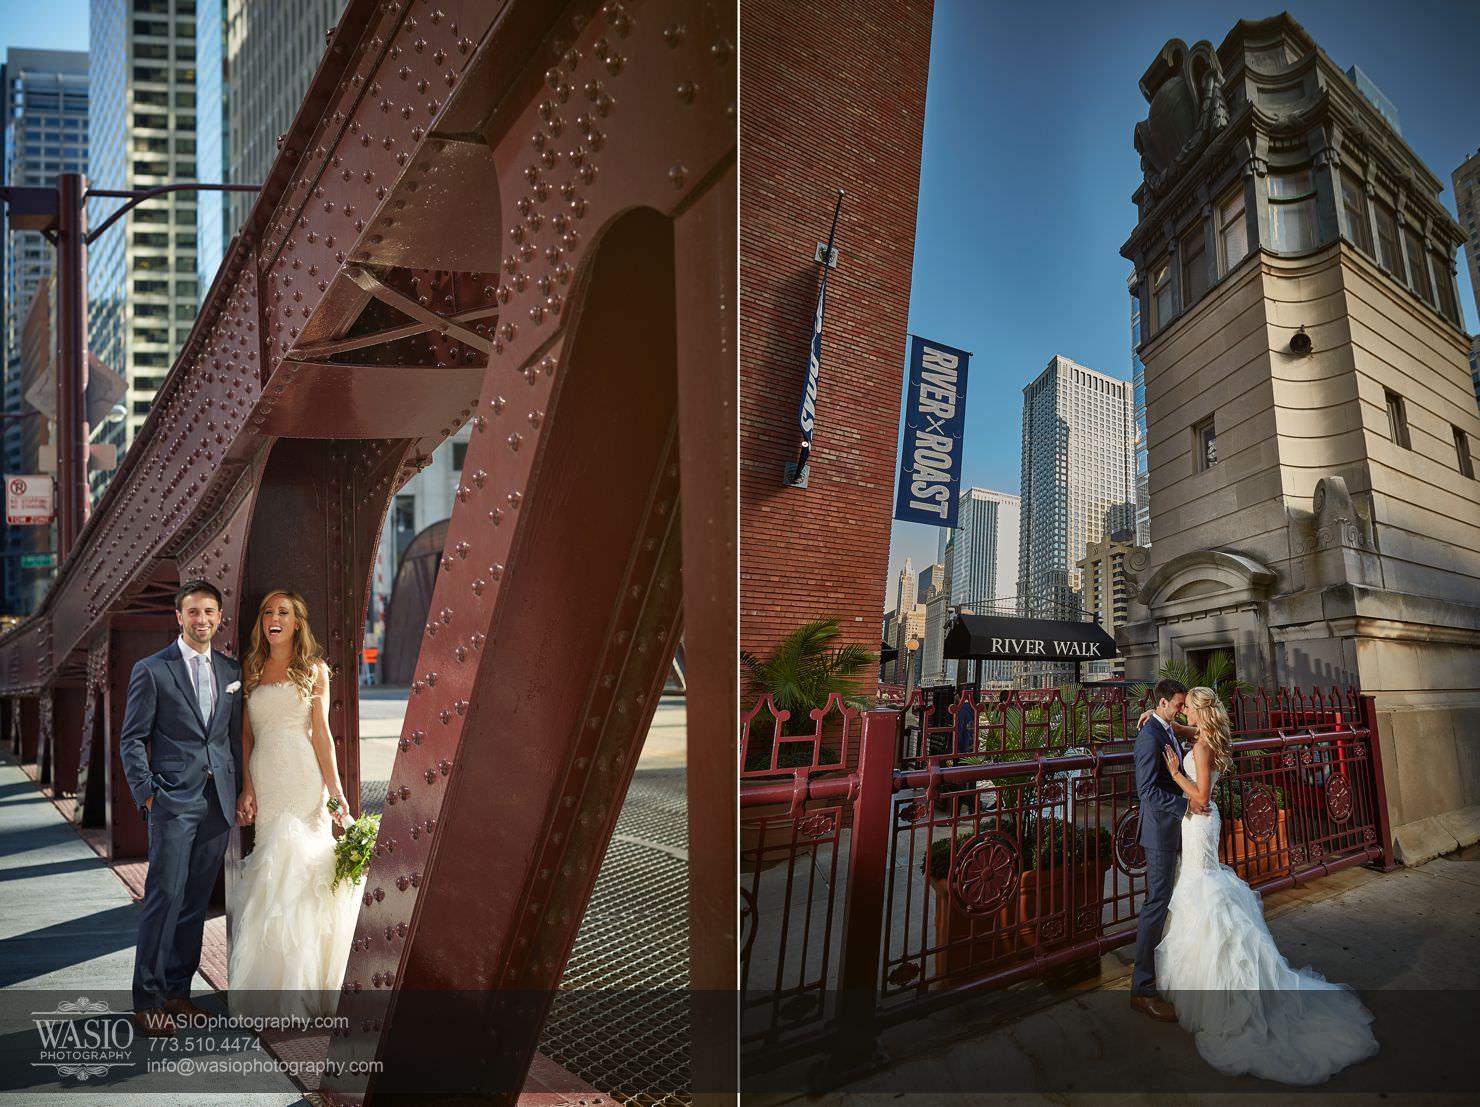 10_Chicago-Gallery-Wedding_3P4C1316-1 Chicago Gallery Wedding - Courtney + Danny